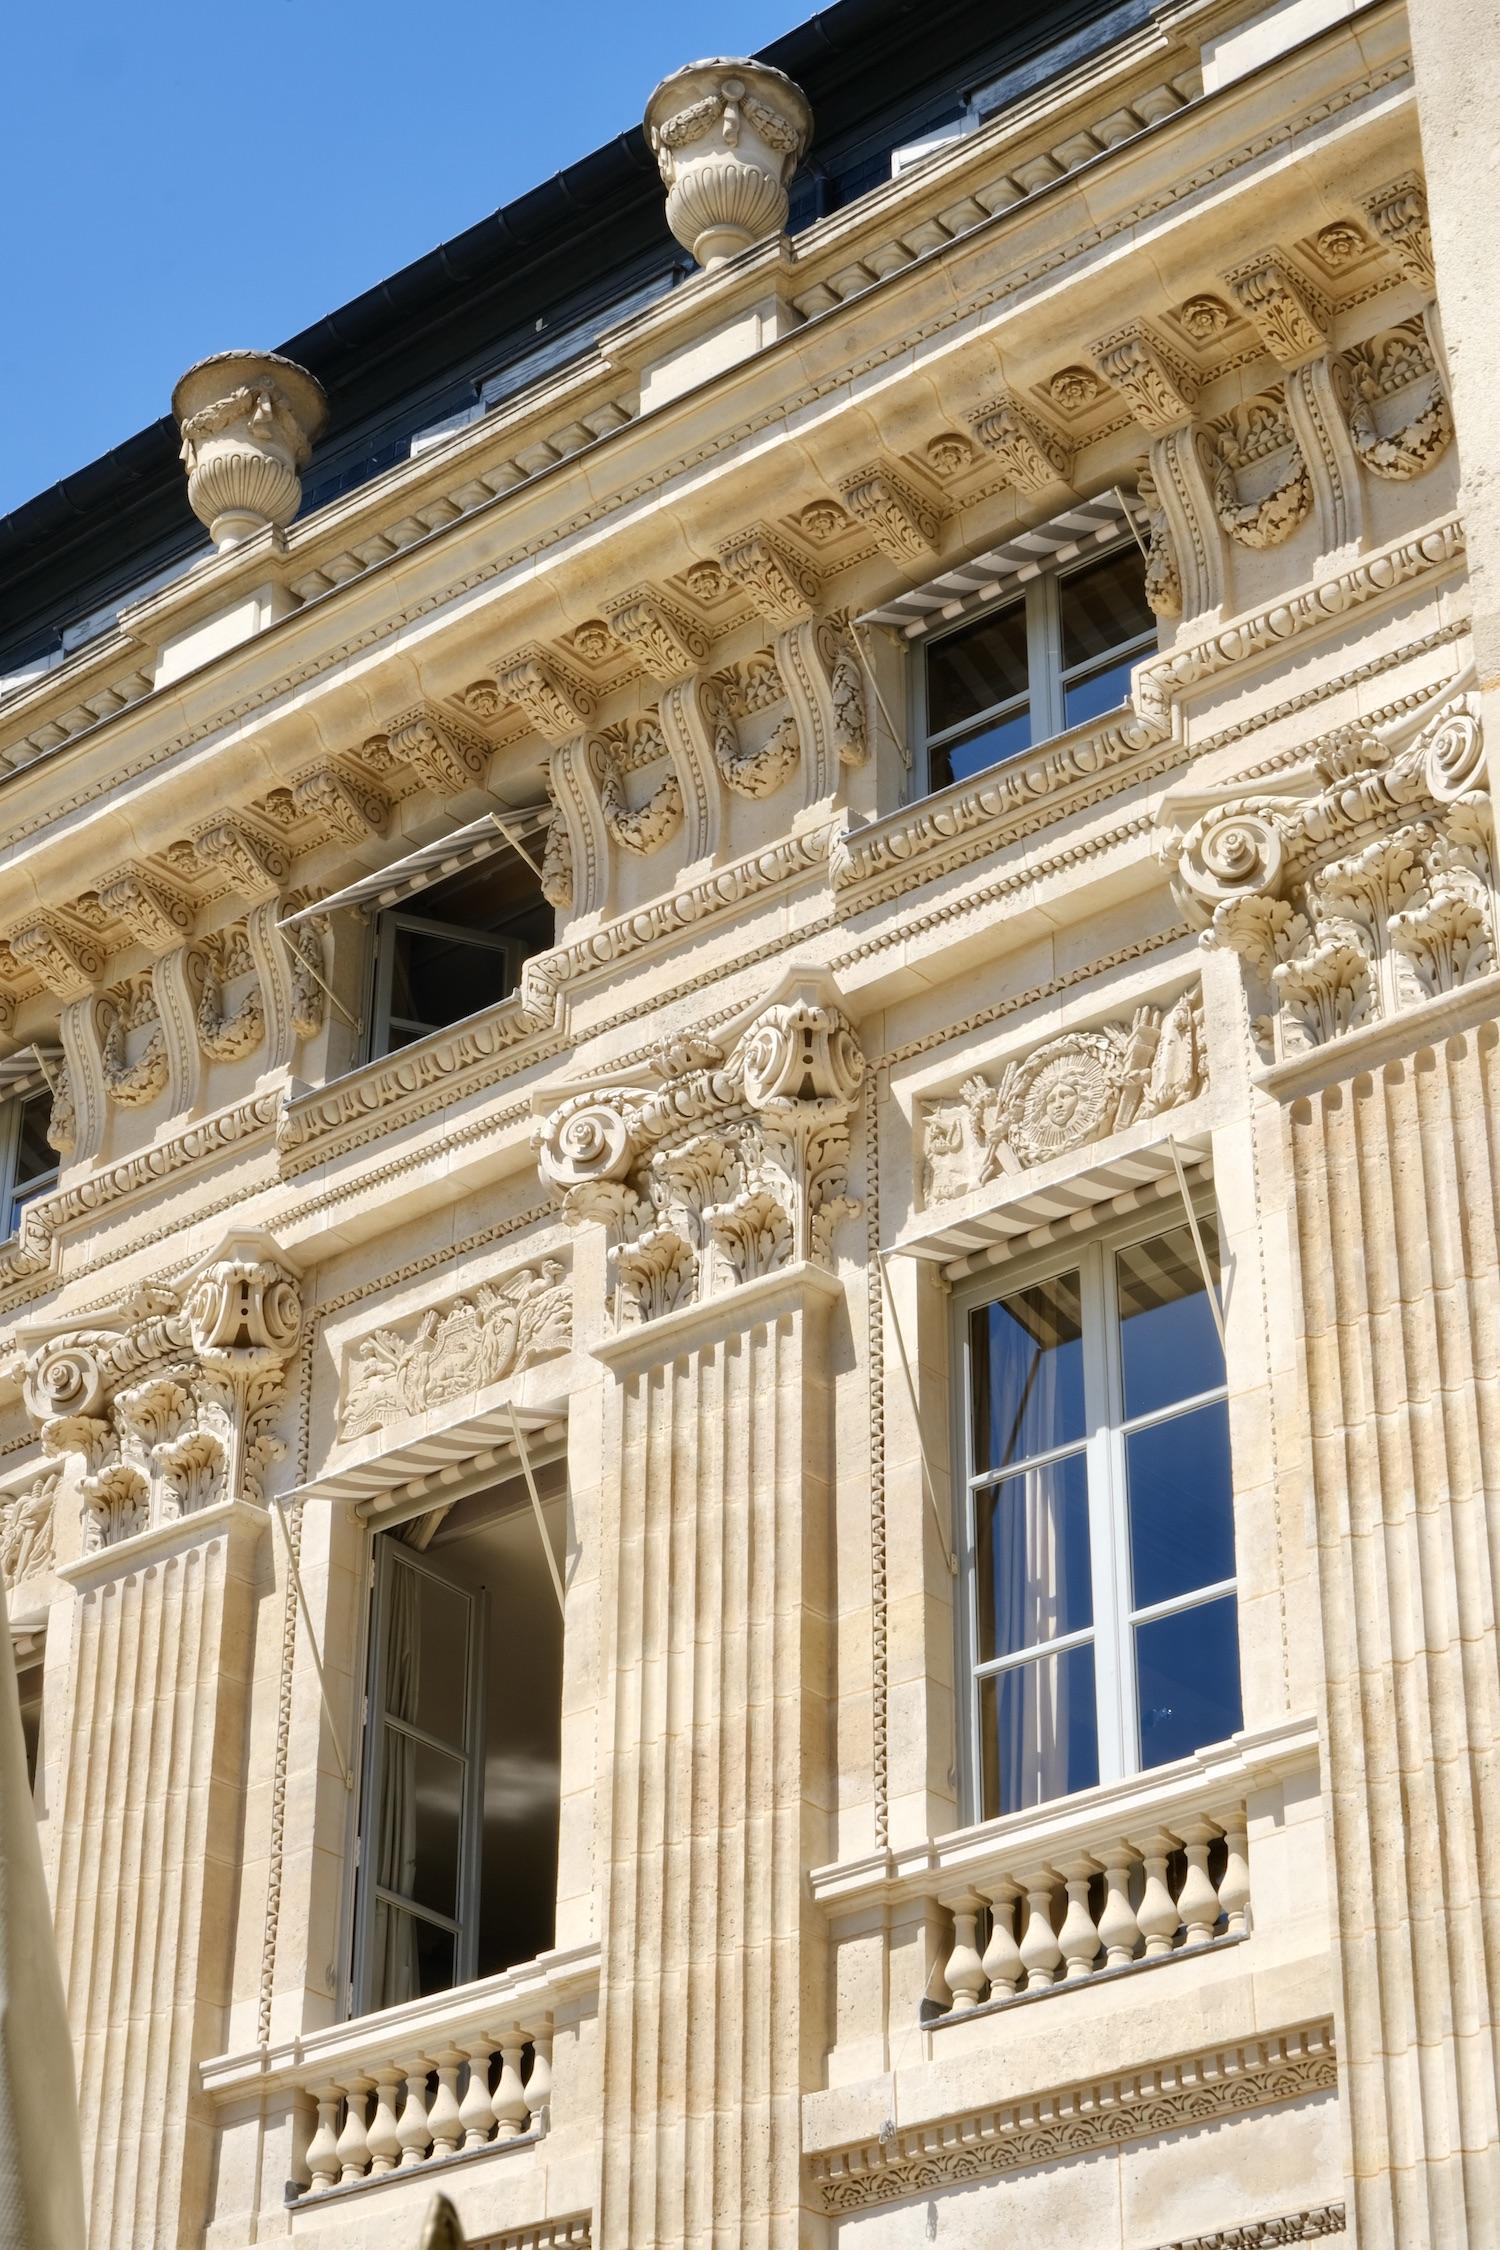 Palais-Royal apartment window